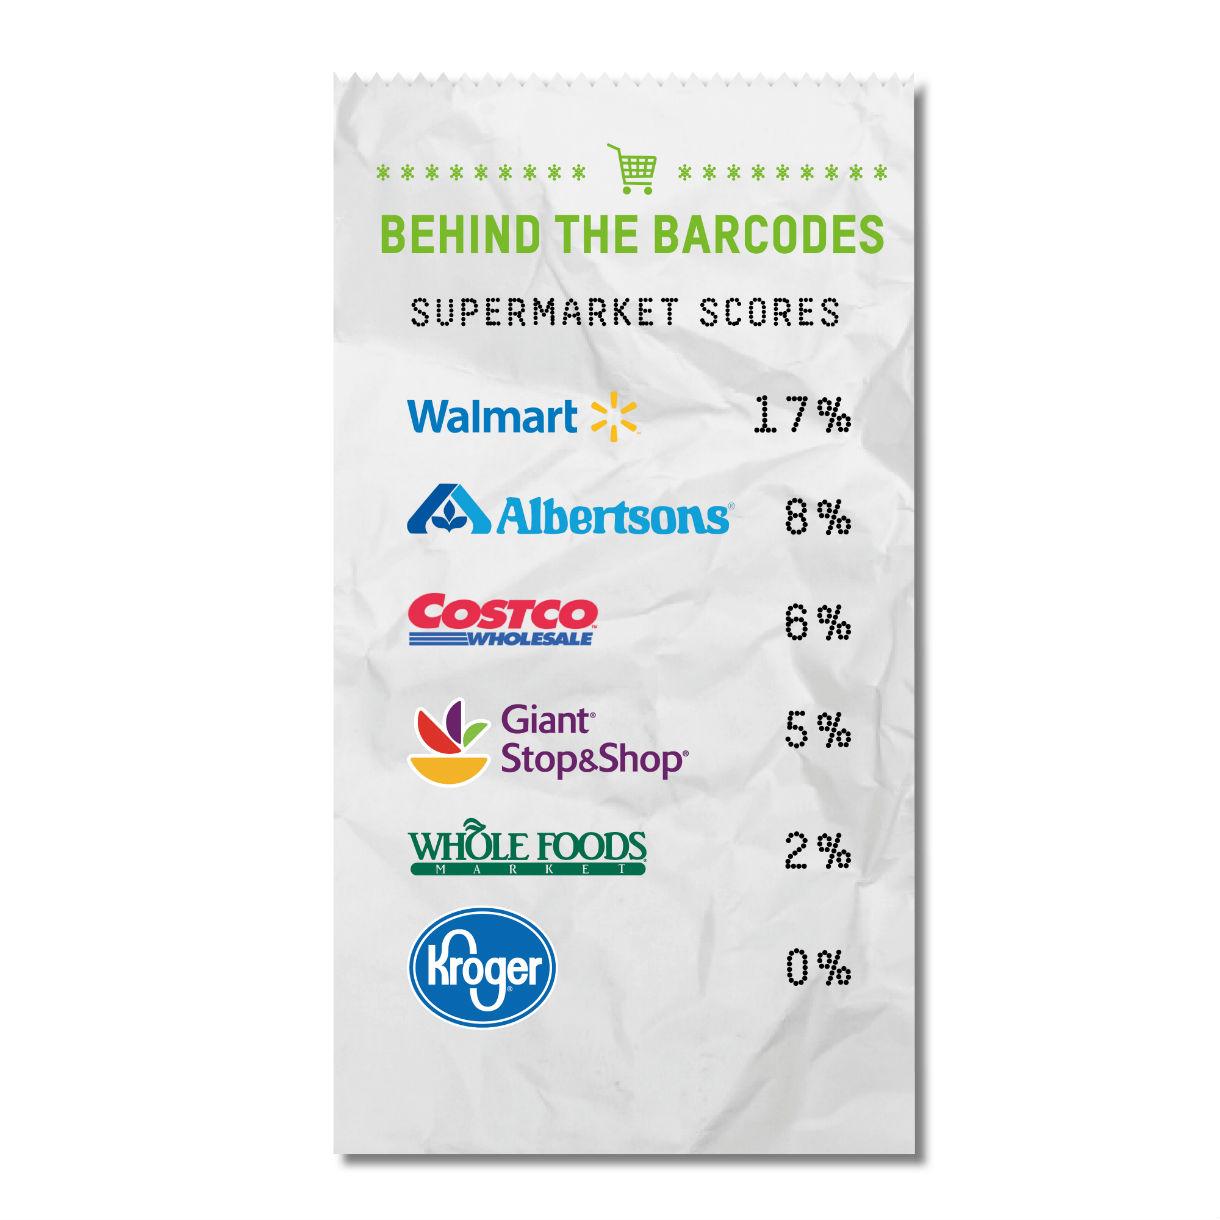 Supermarket Scorecard